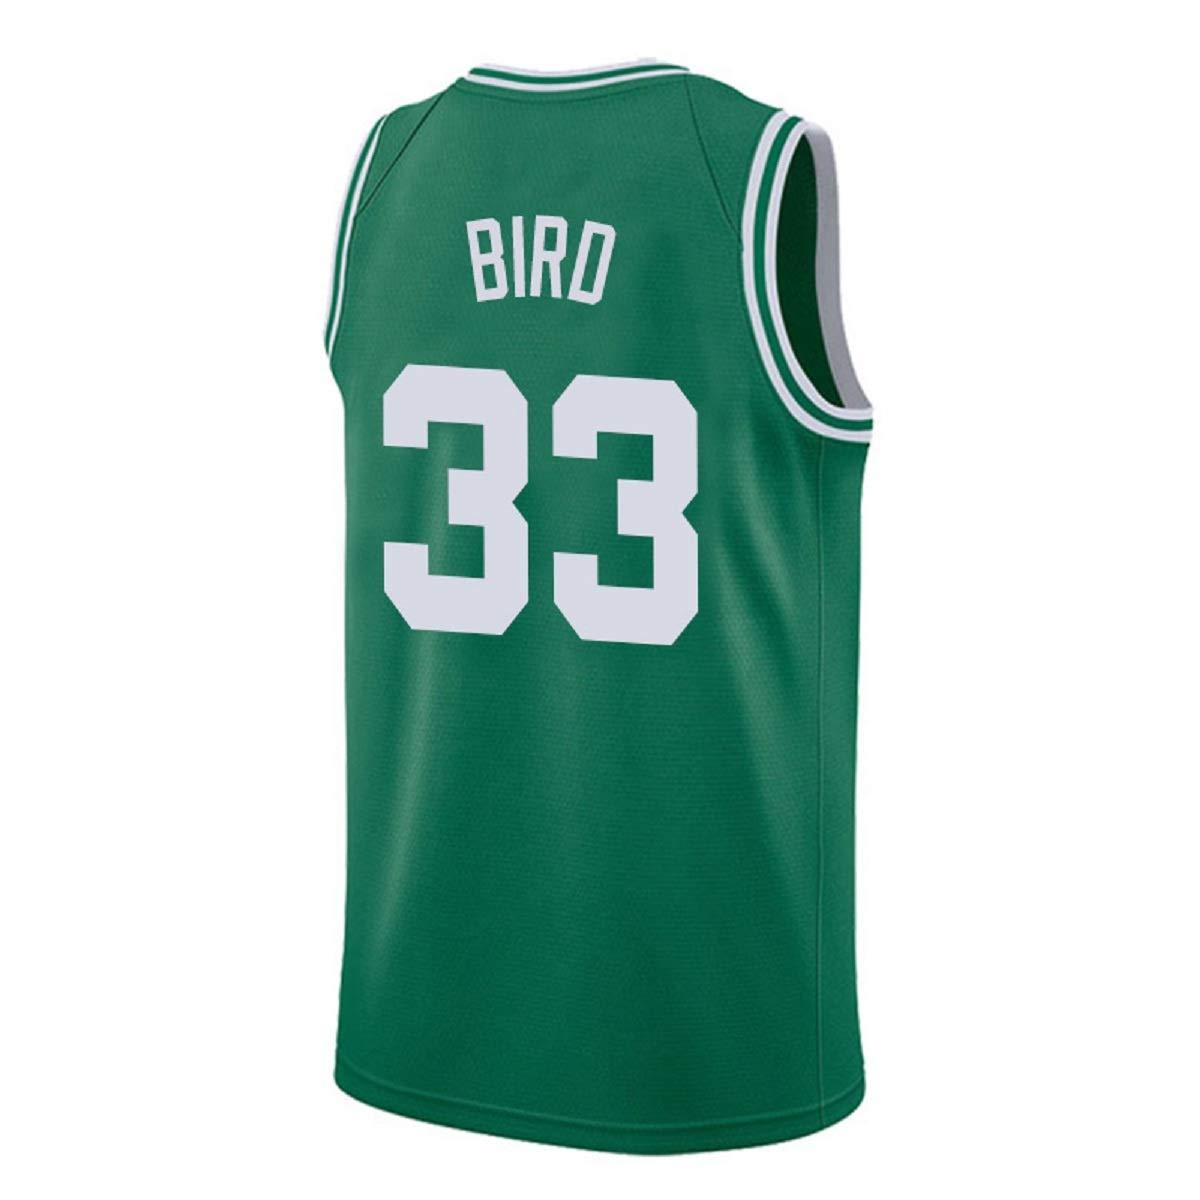 newest 027c0 a06b3 Youth Bird Jersey Boston 33 Kid's Basketball Jersey Larry Boy's Jerseys  Green and White(S-XL)